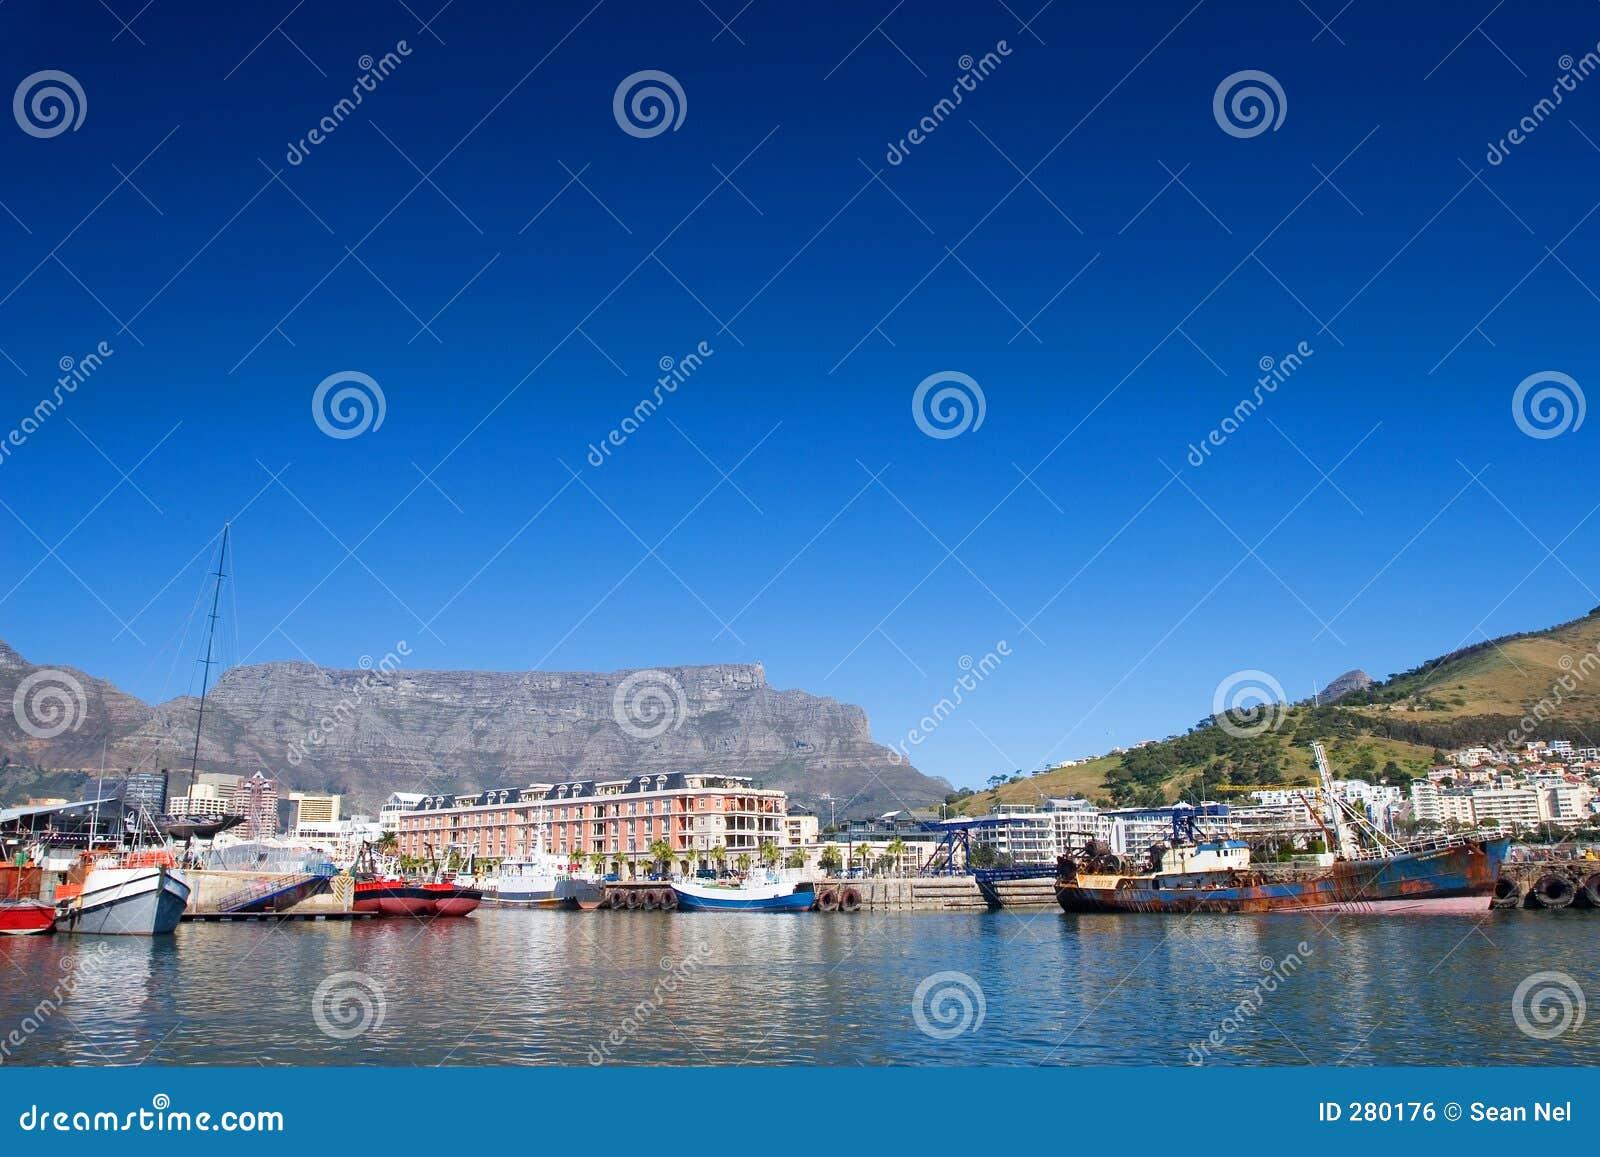 Harbour #22